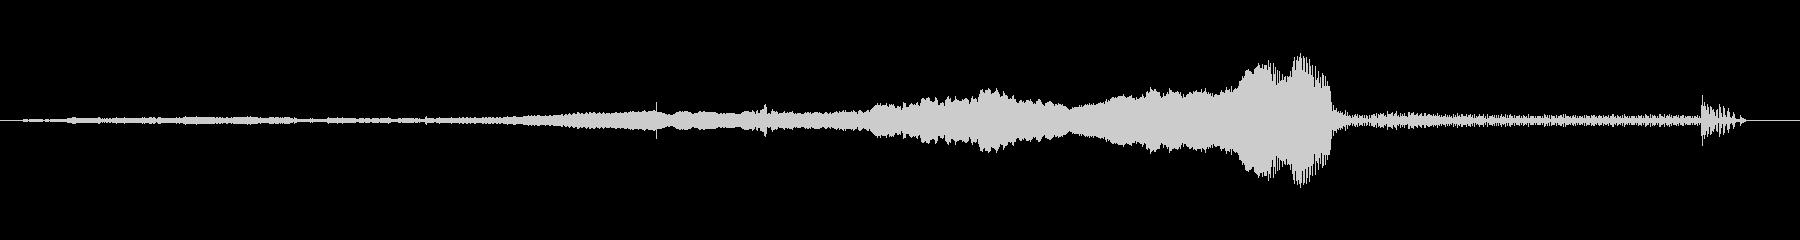 Integraロングアプローチ、中...の未再生の波形